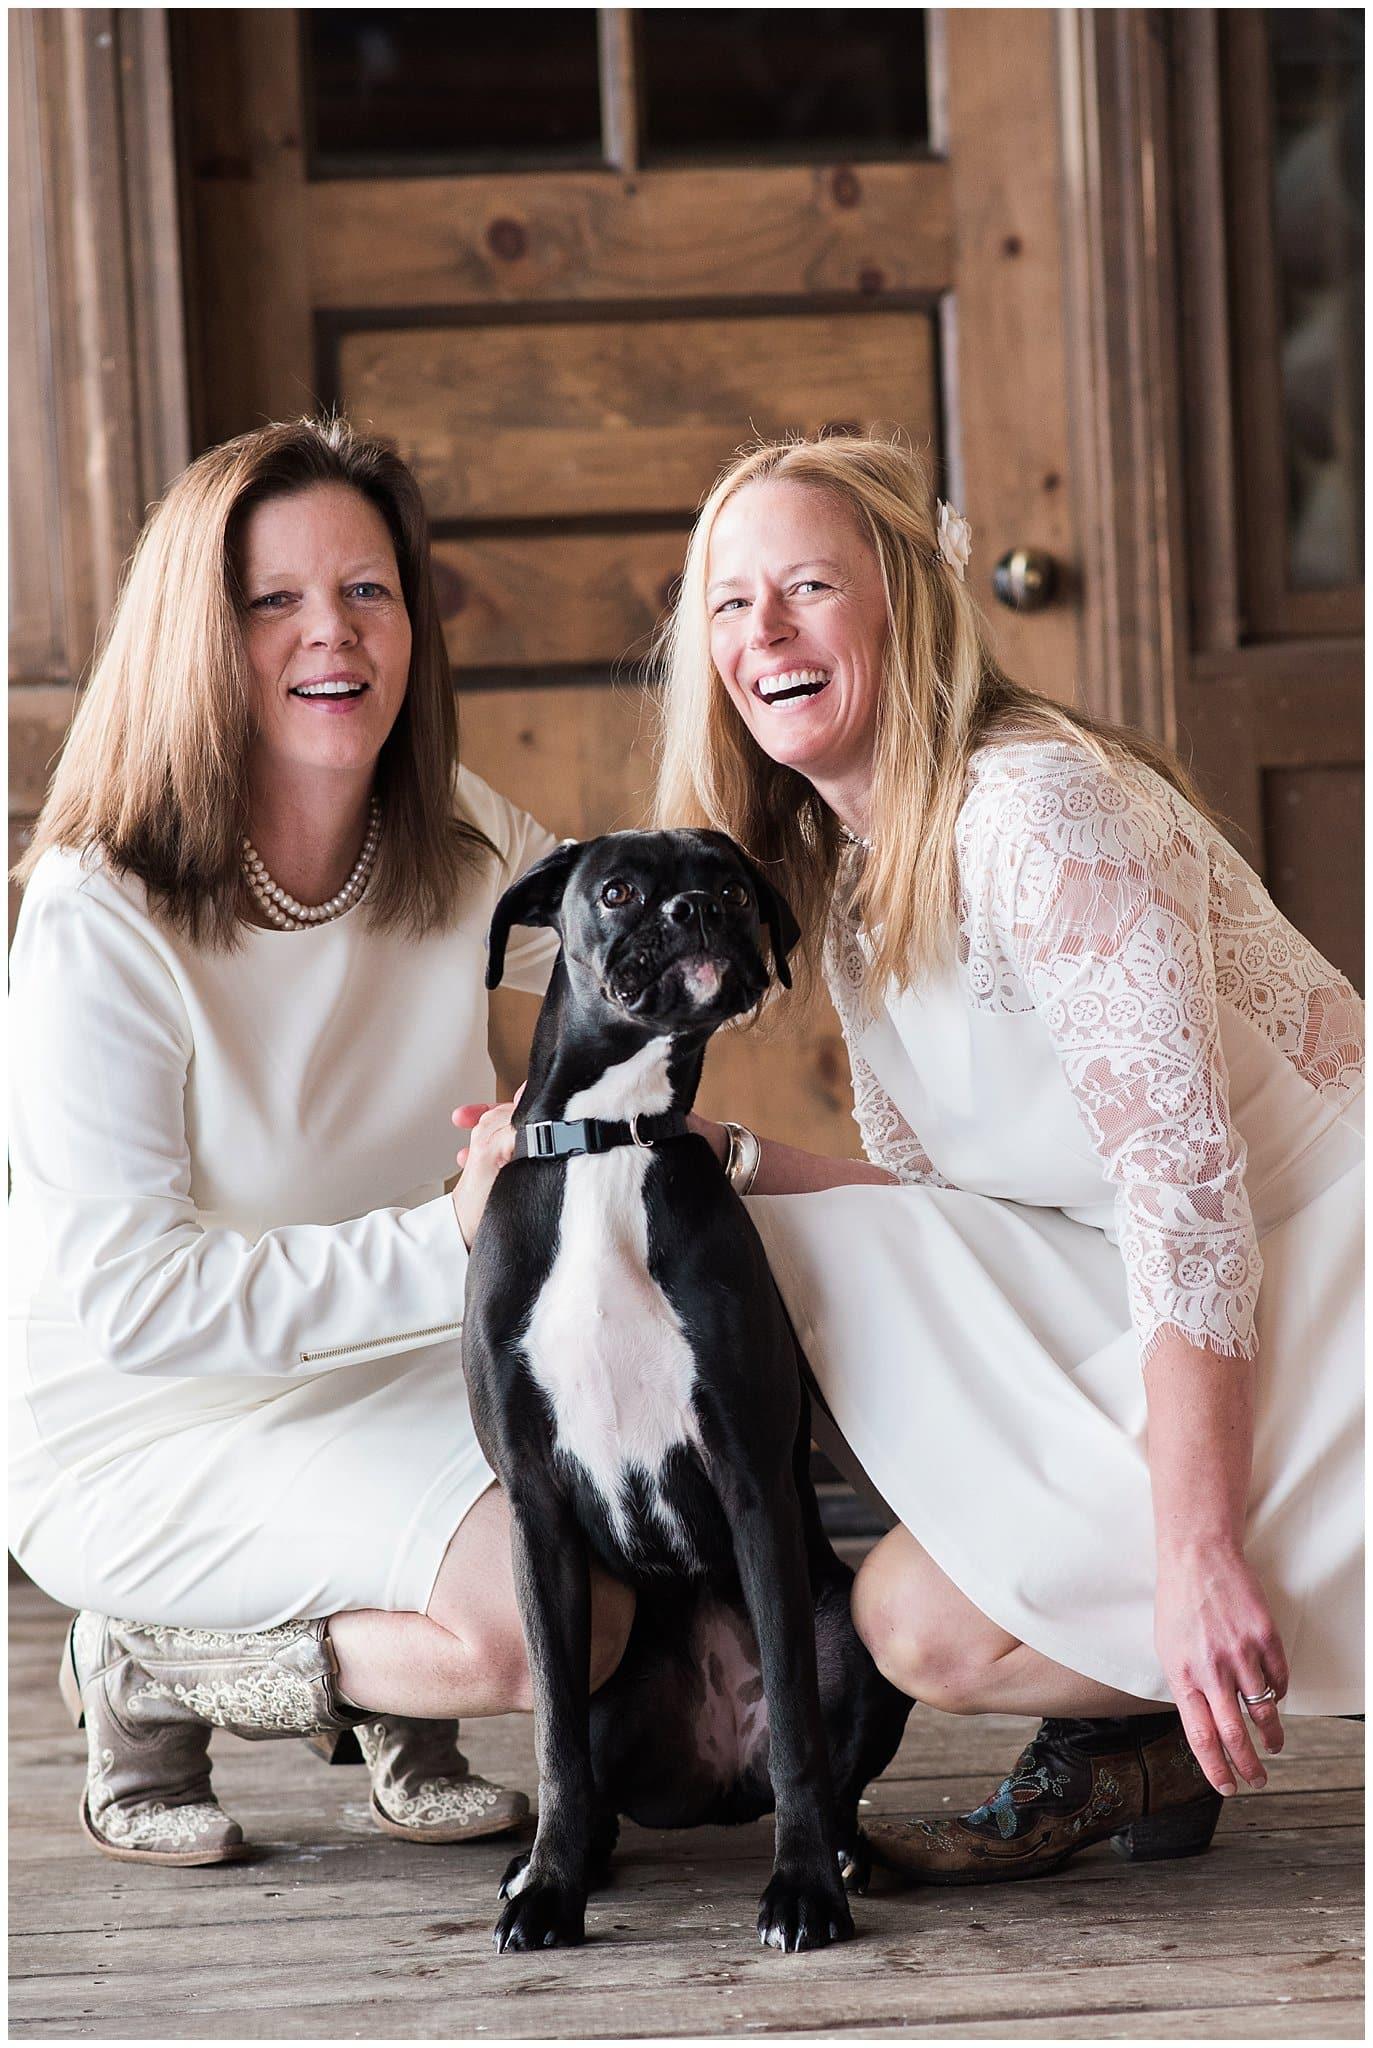 brides with dog on wedding day photo